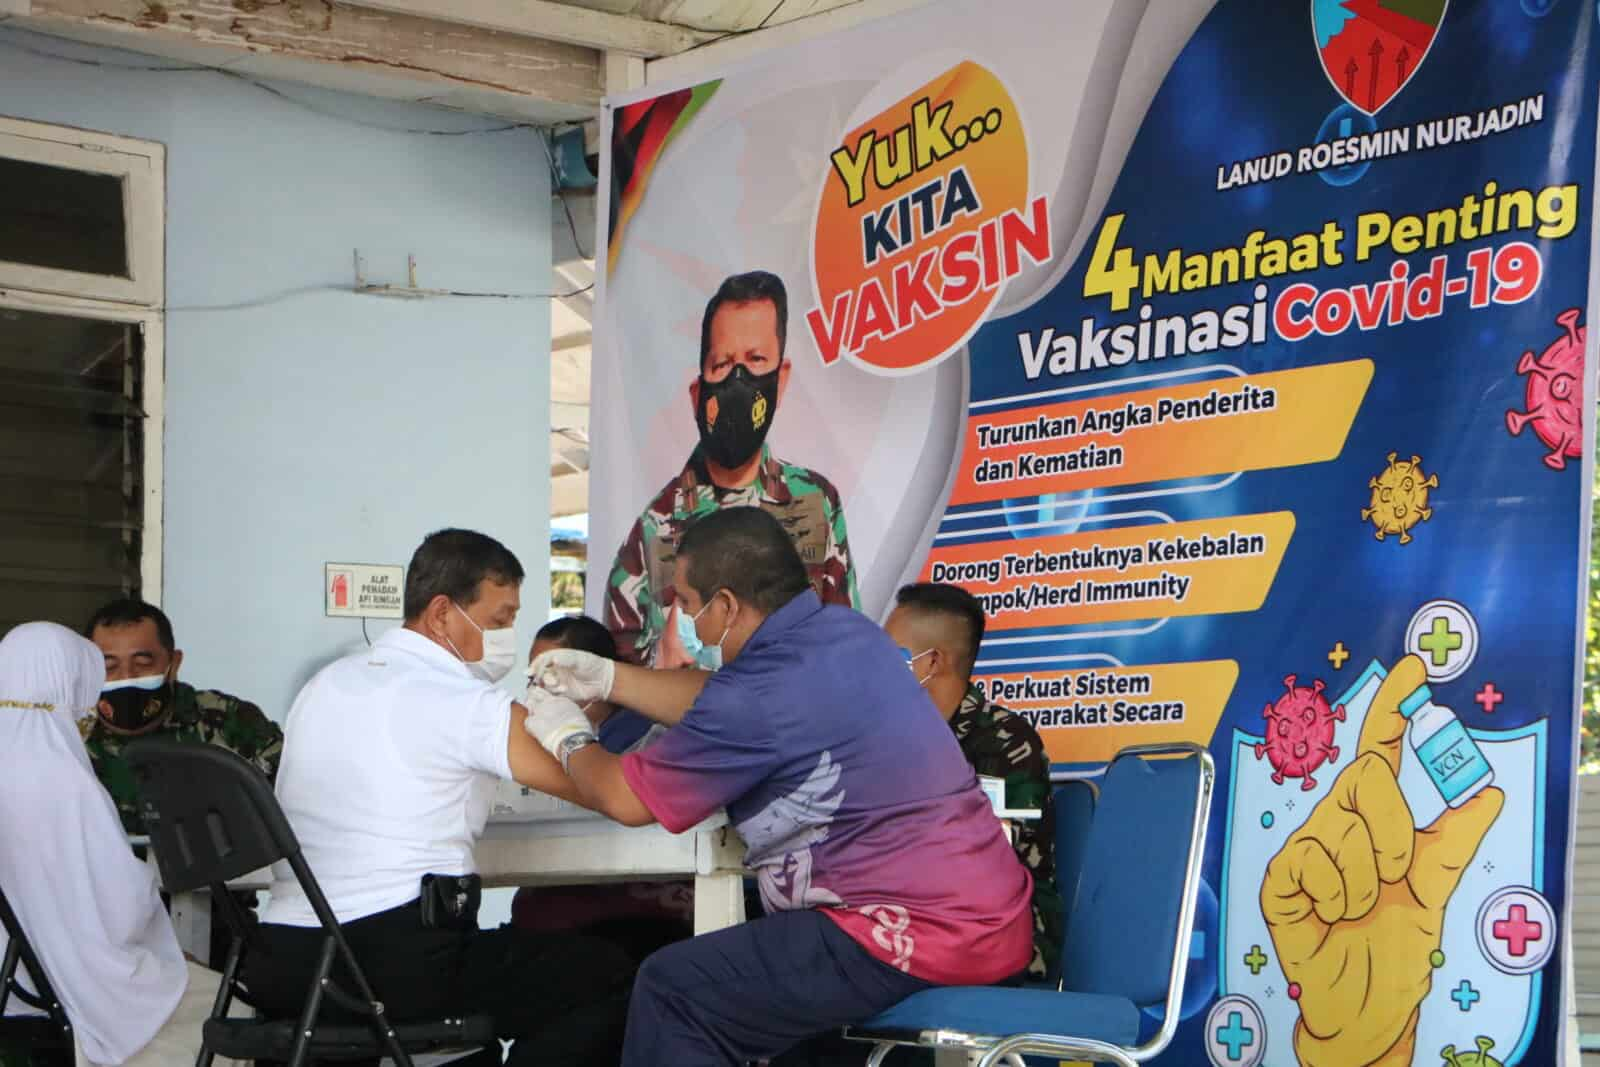 Danlanud Rsn: Tidak Kenal Hari Libur, Lanud Rsn akan Terus Vaksinasi Warga